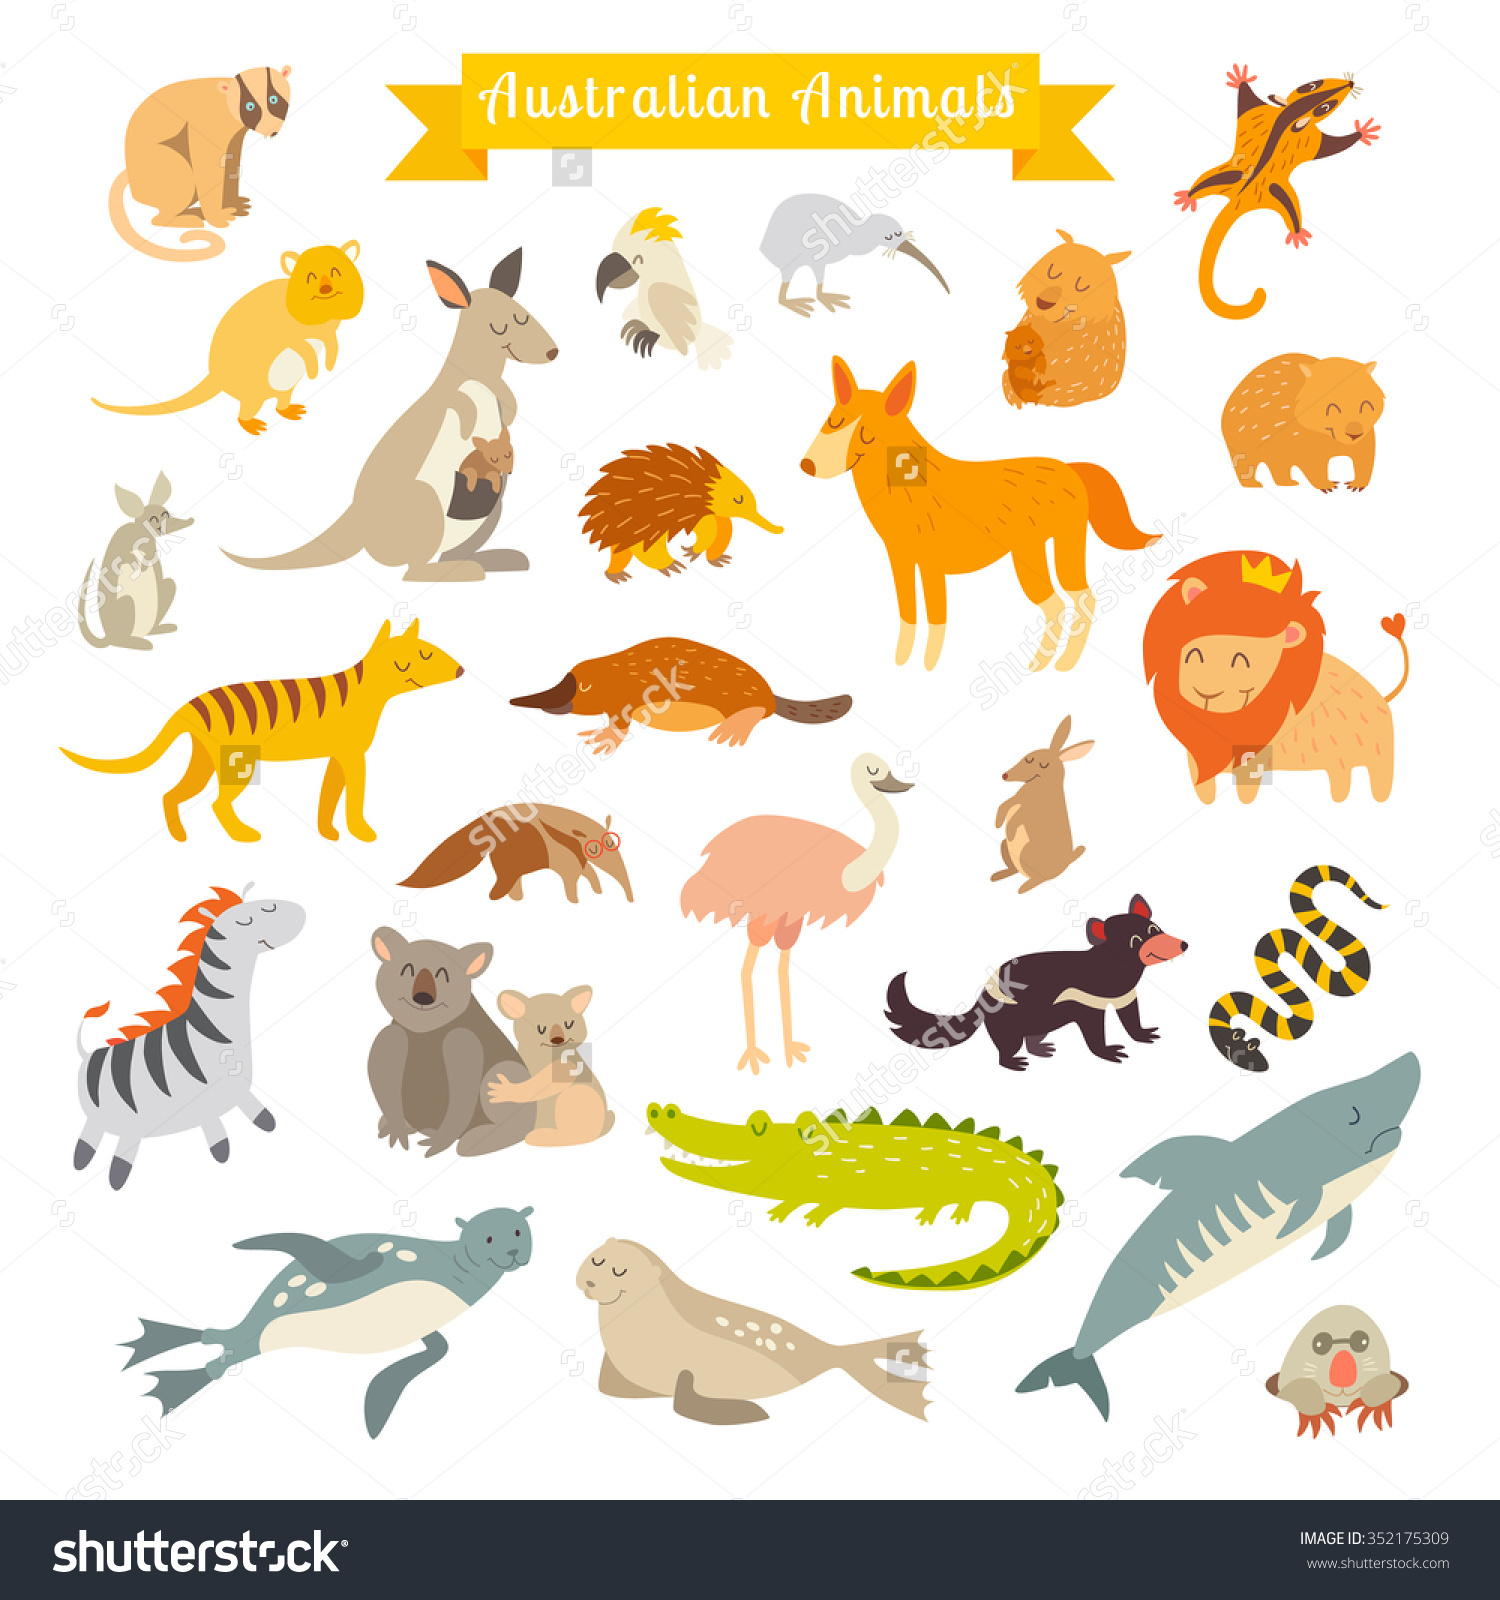 Wildlife Australia Clipart